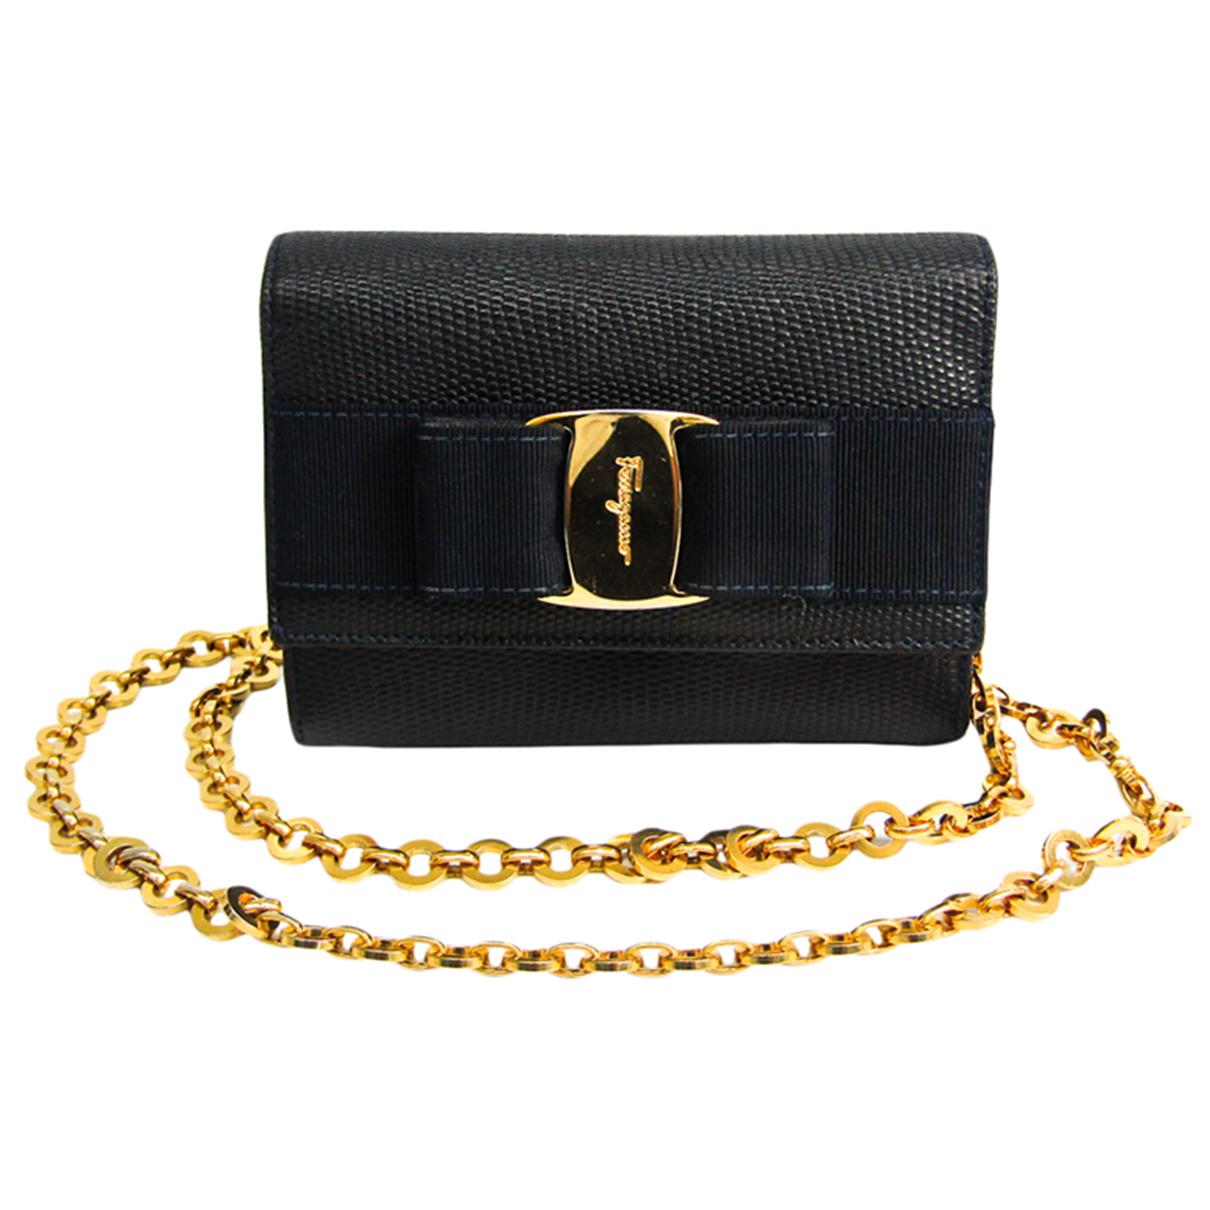 Salvatore Ferragamo Vara Navy Leather handbag for Women N